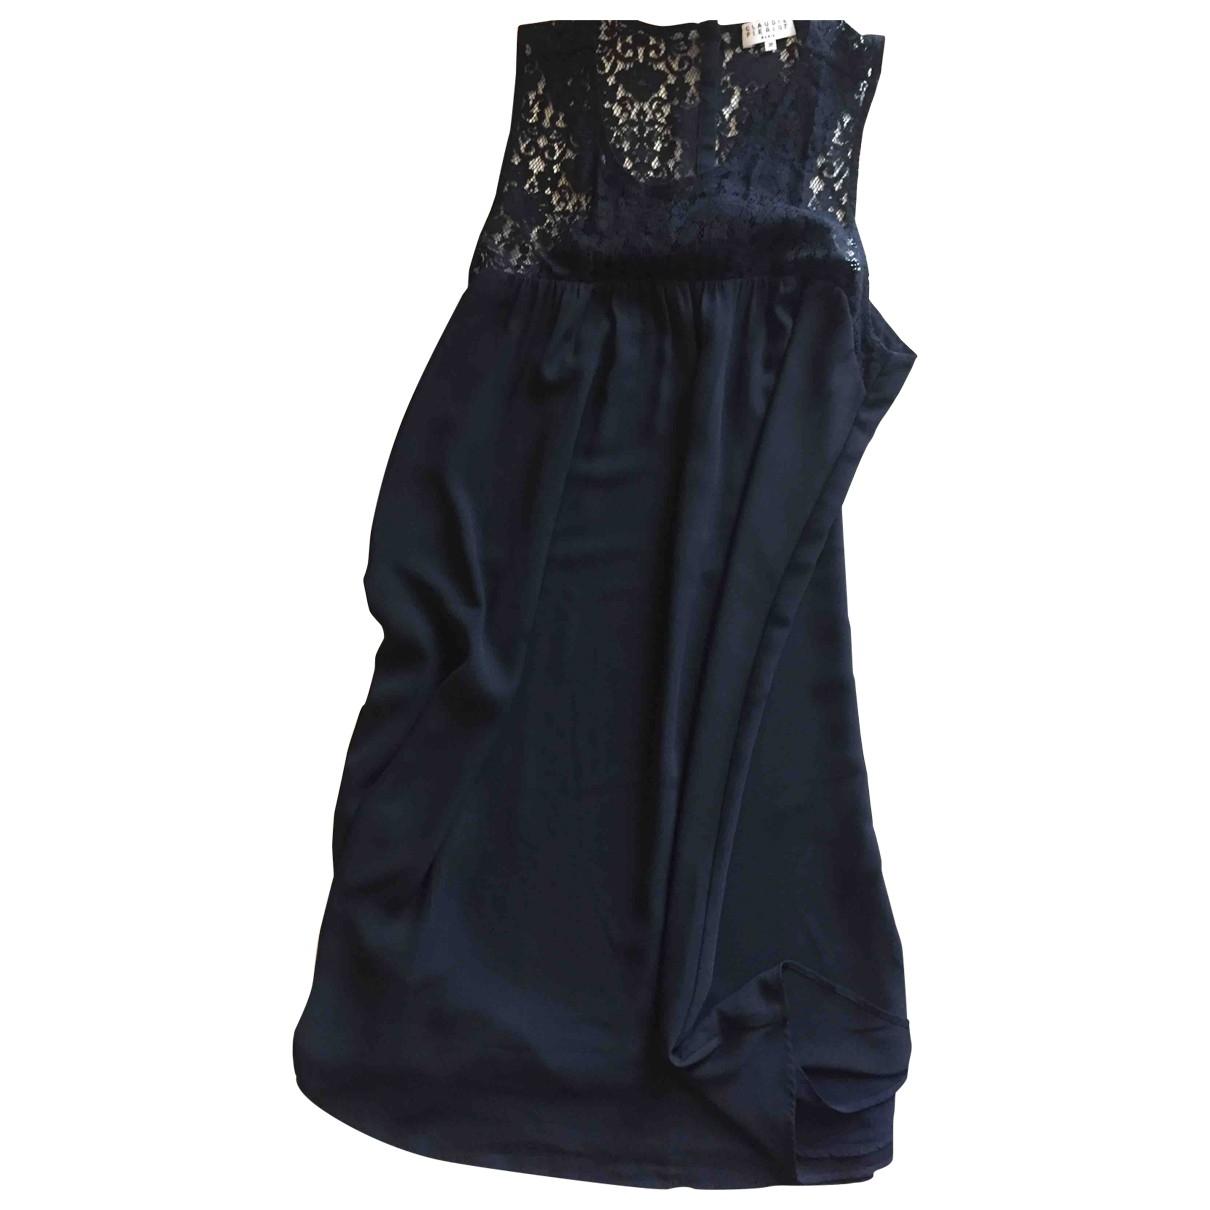 Claudie Pierlot \N Navy dress for Women 38 FR